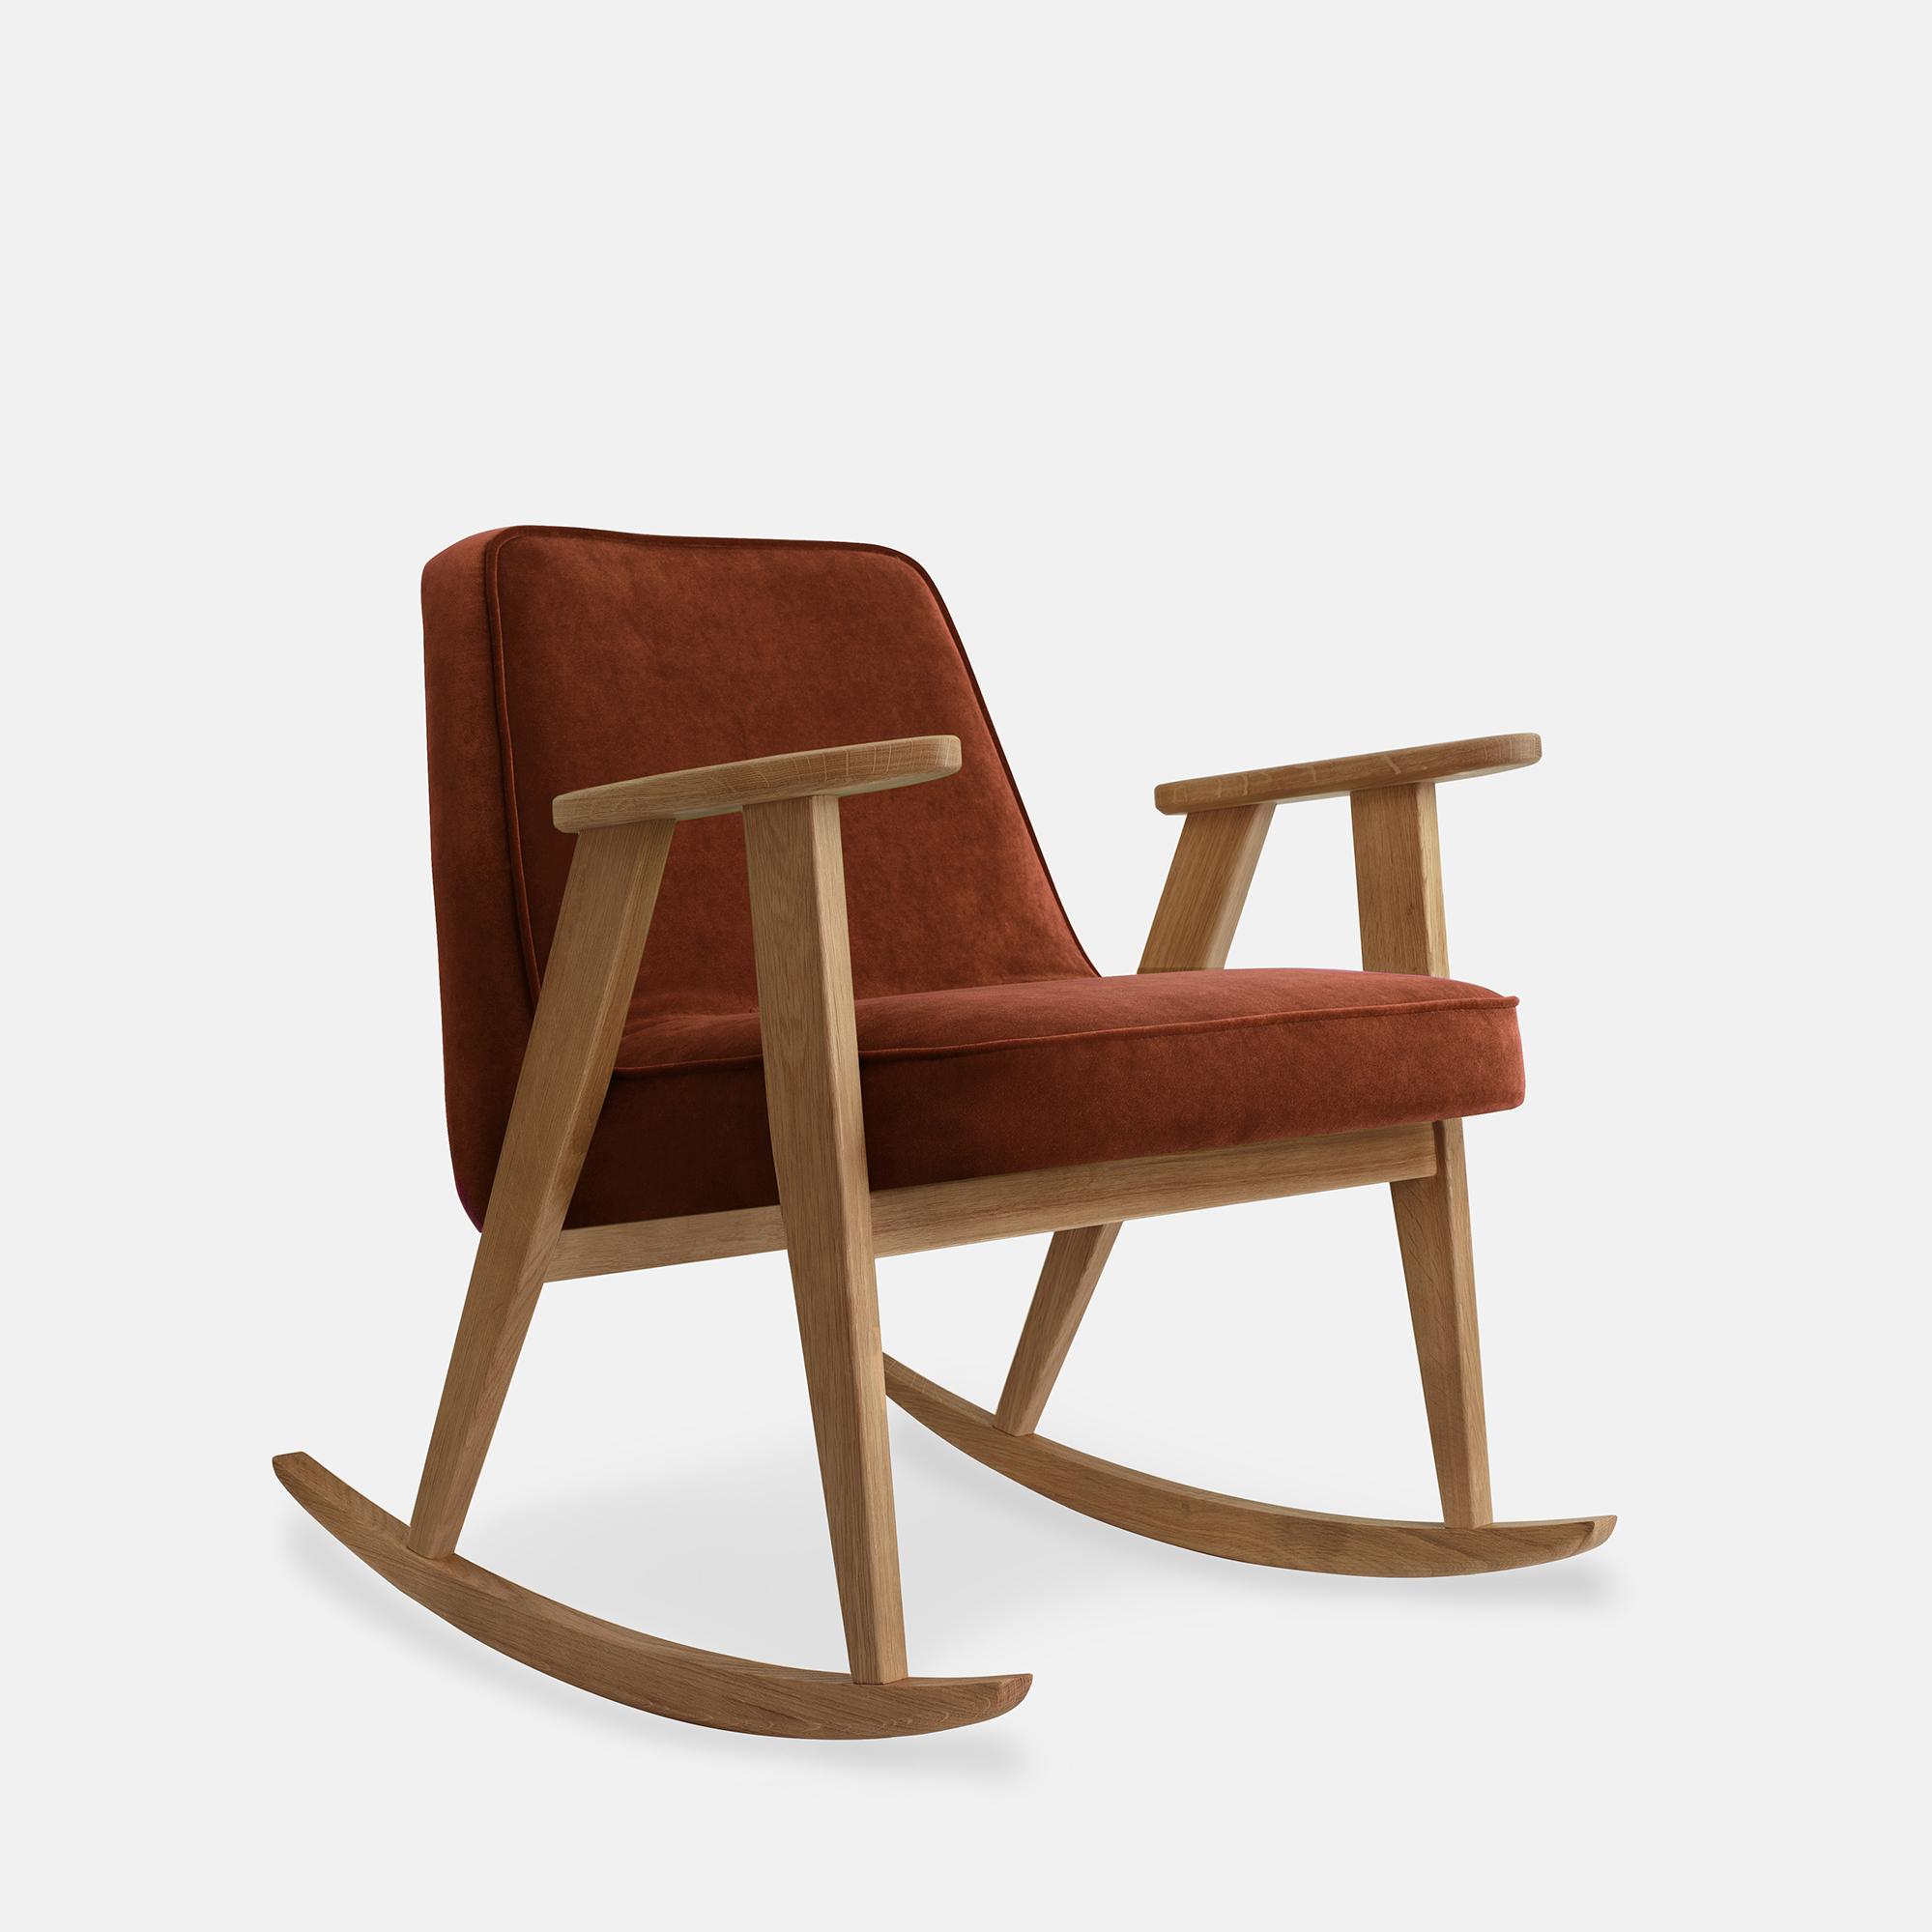 366-Concept-366-Rocking-Chair-W02-Velvet-Red-Brick